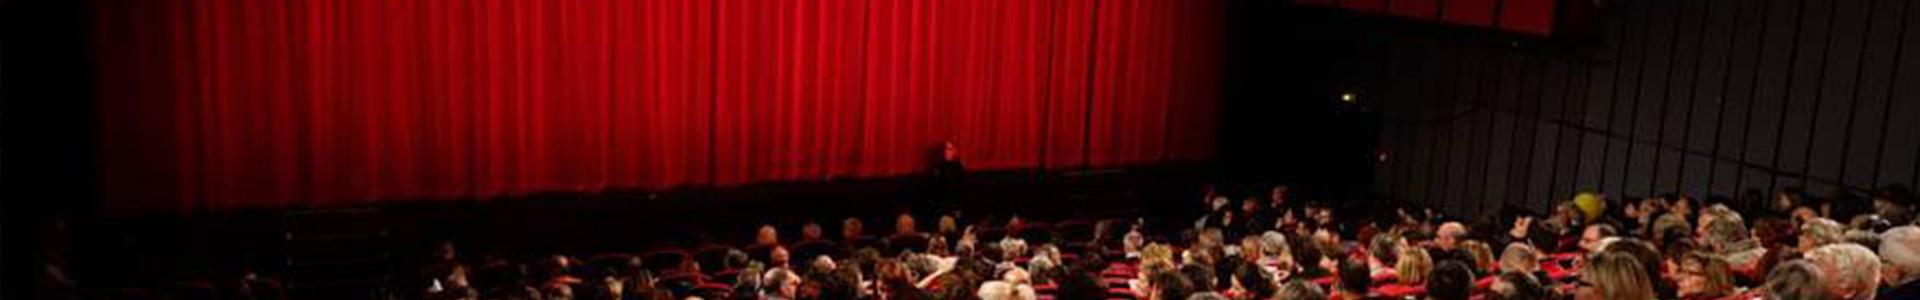 theatre-2846